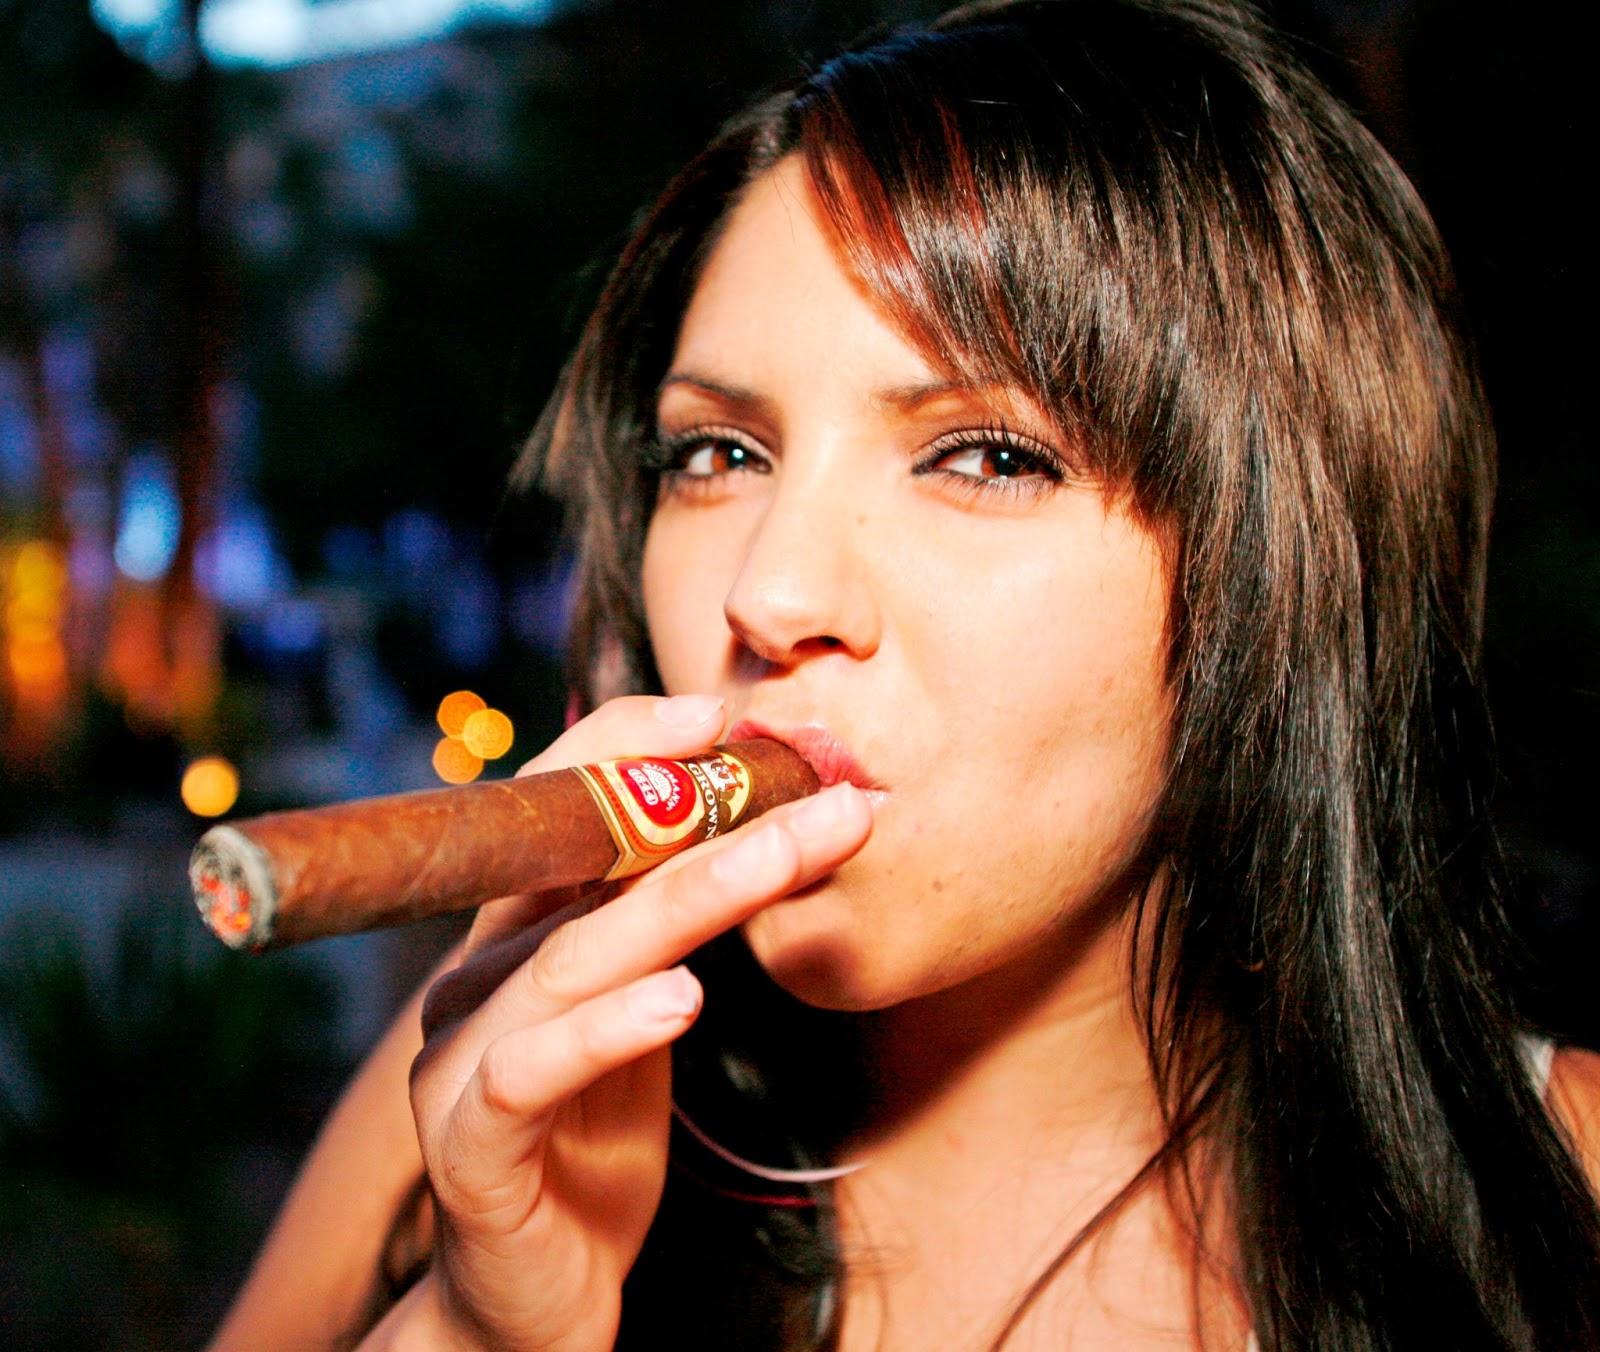 video-wife-cigar-smokes-gomez-stripping-nude